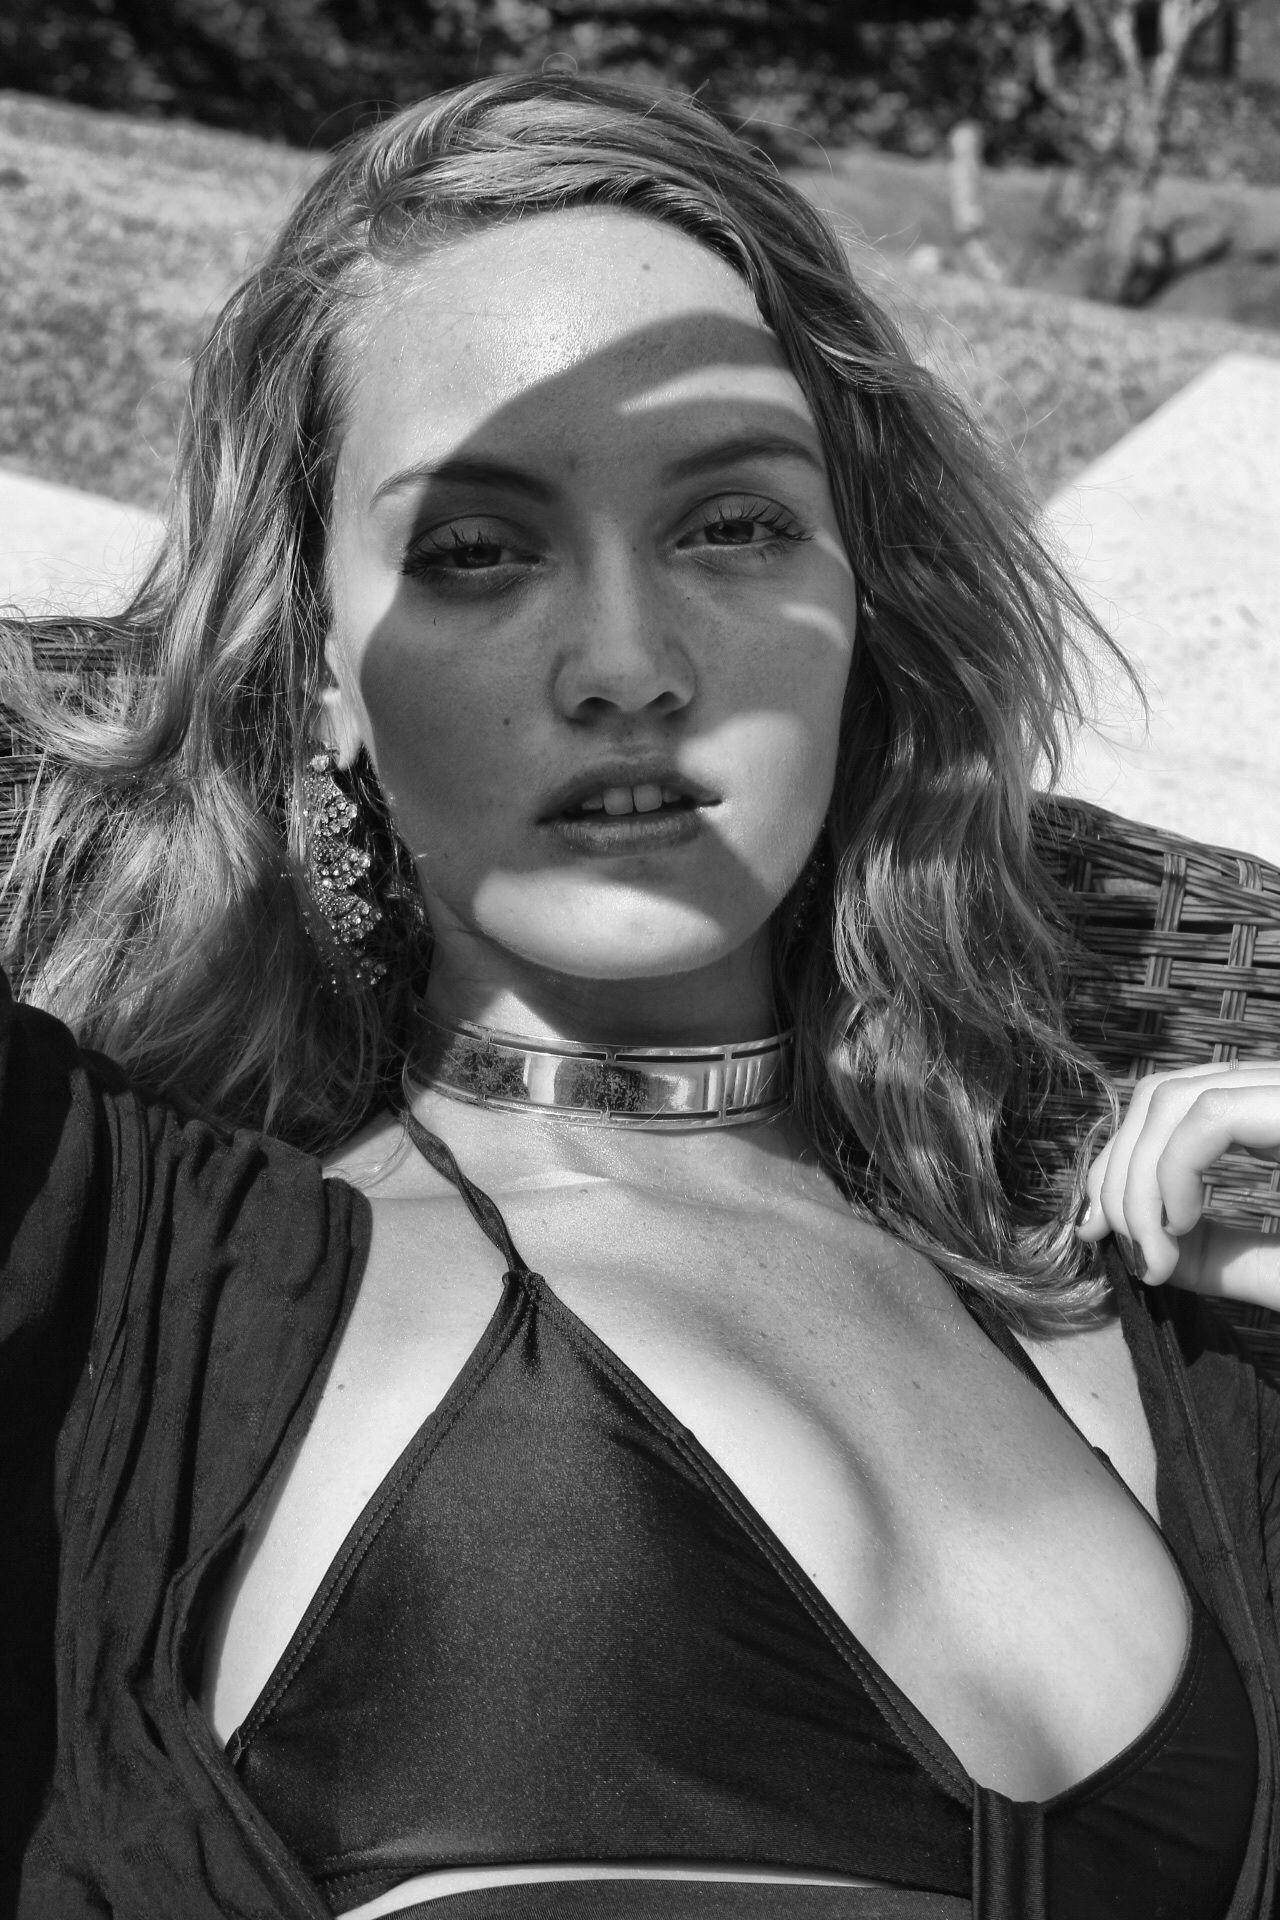 Foto e Styling  Luiza Gil Modelo  Isadora Di Domenico Para Agência Epohke bcdb0a60627